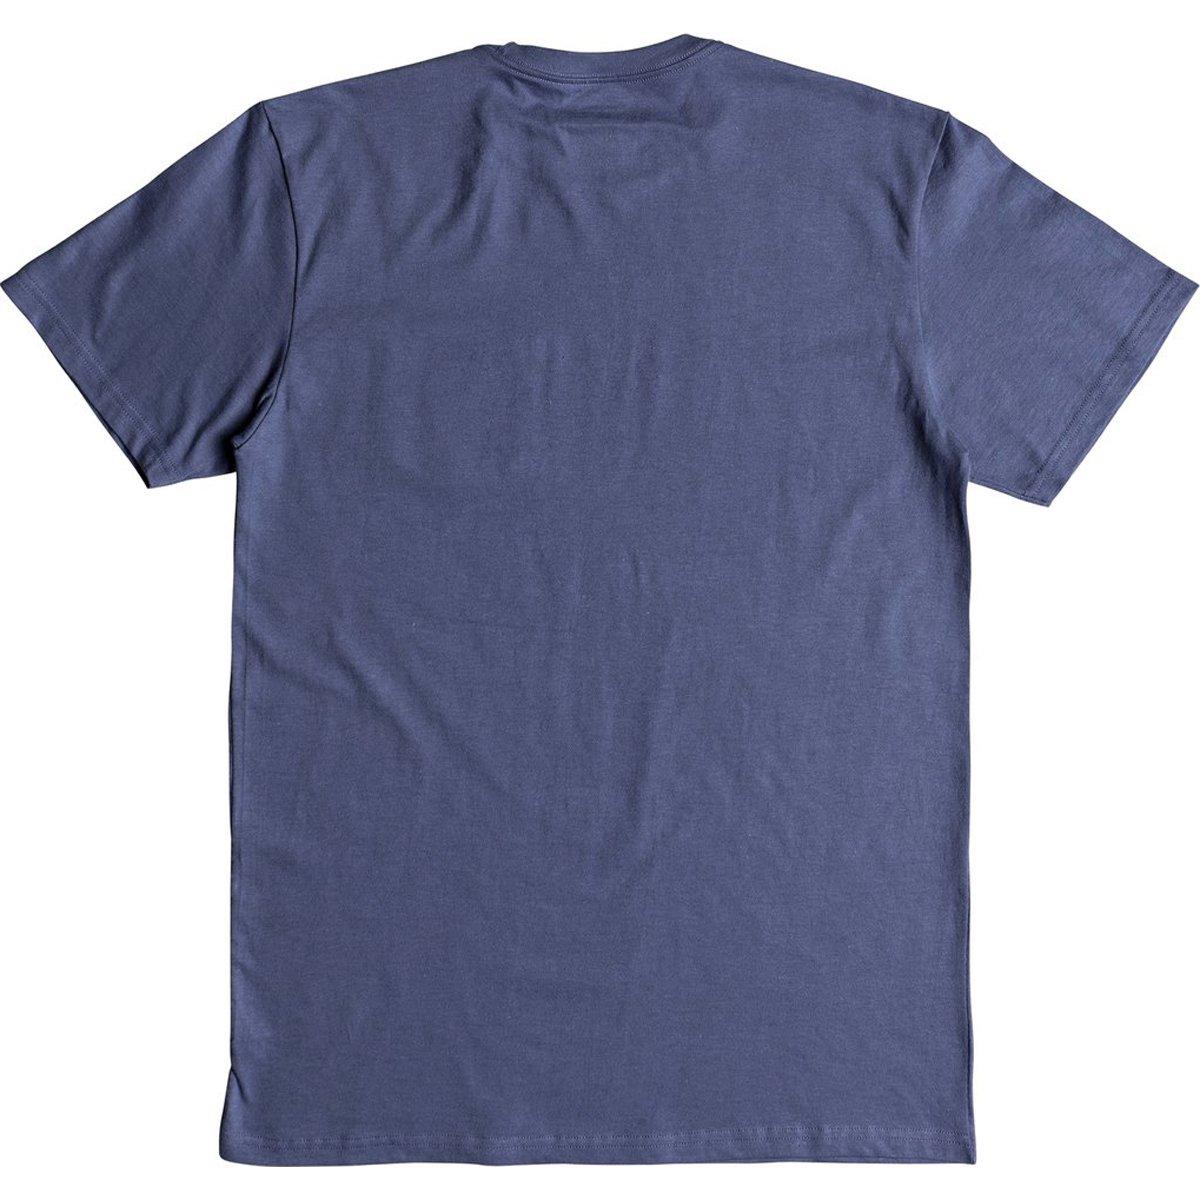 Quiksilver Men's Crosstown Tee Shirt, Bijou Blue, XL by Quiksilver (Image #2)